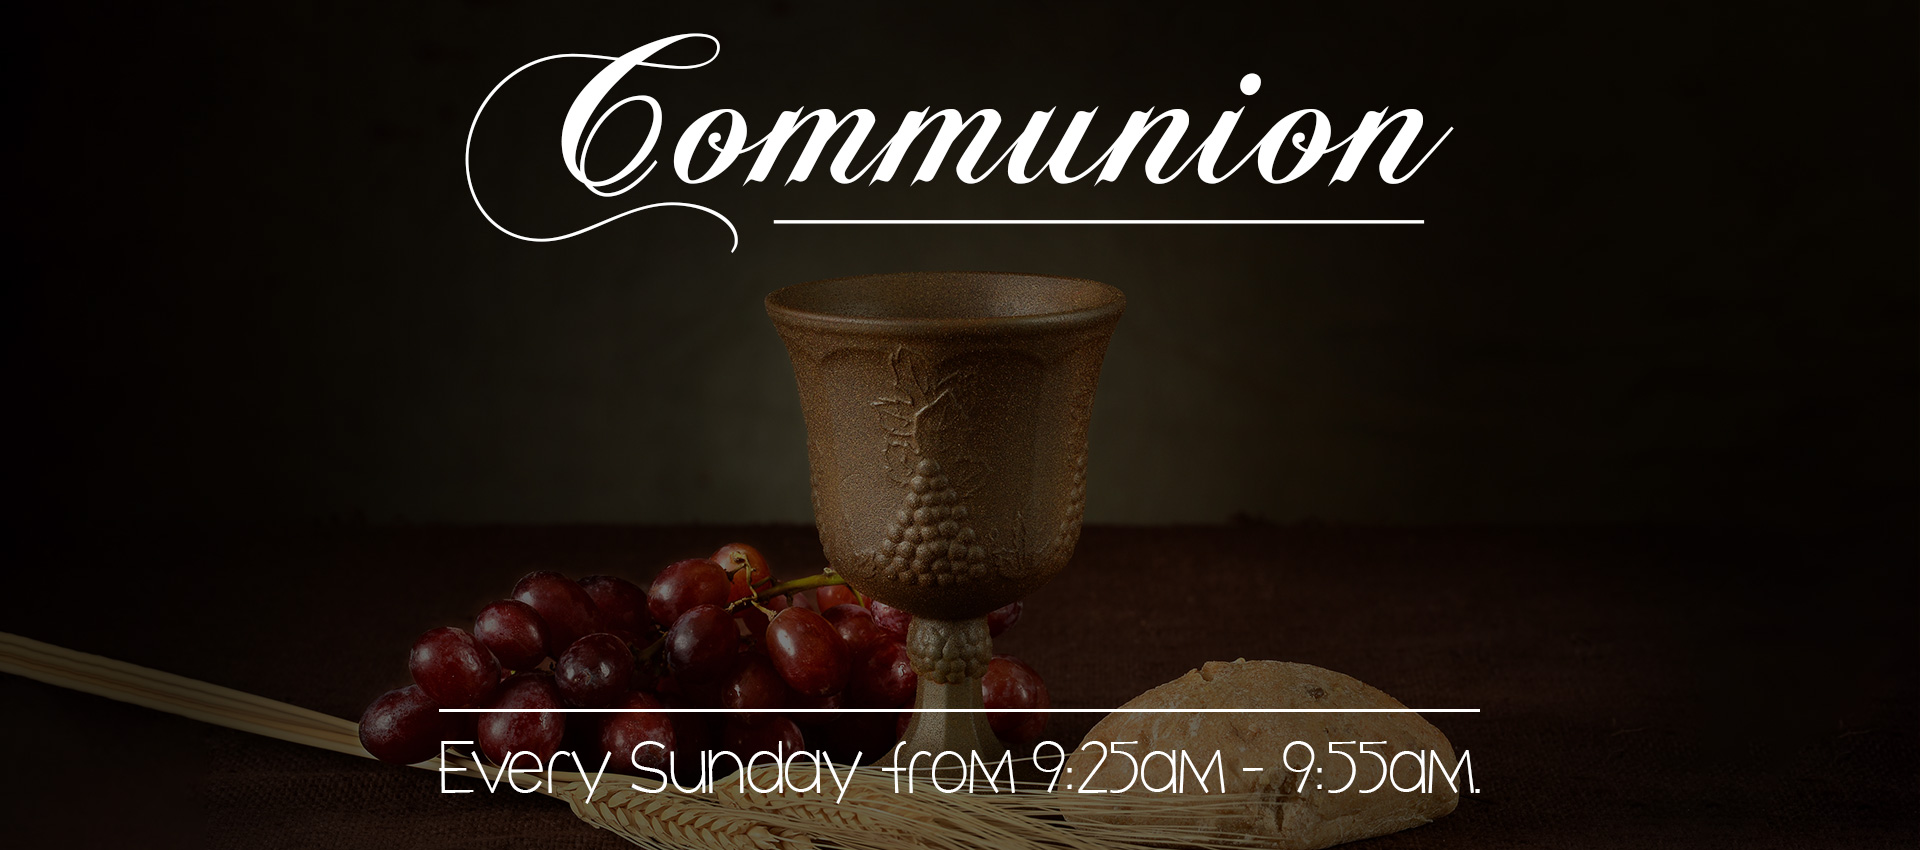 Communion every Sunday at 9:25am-9:55am